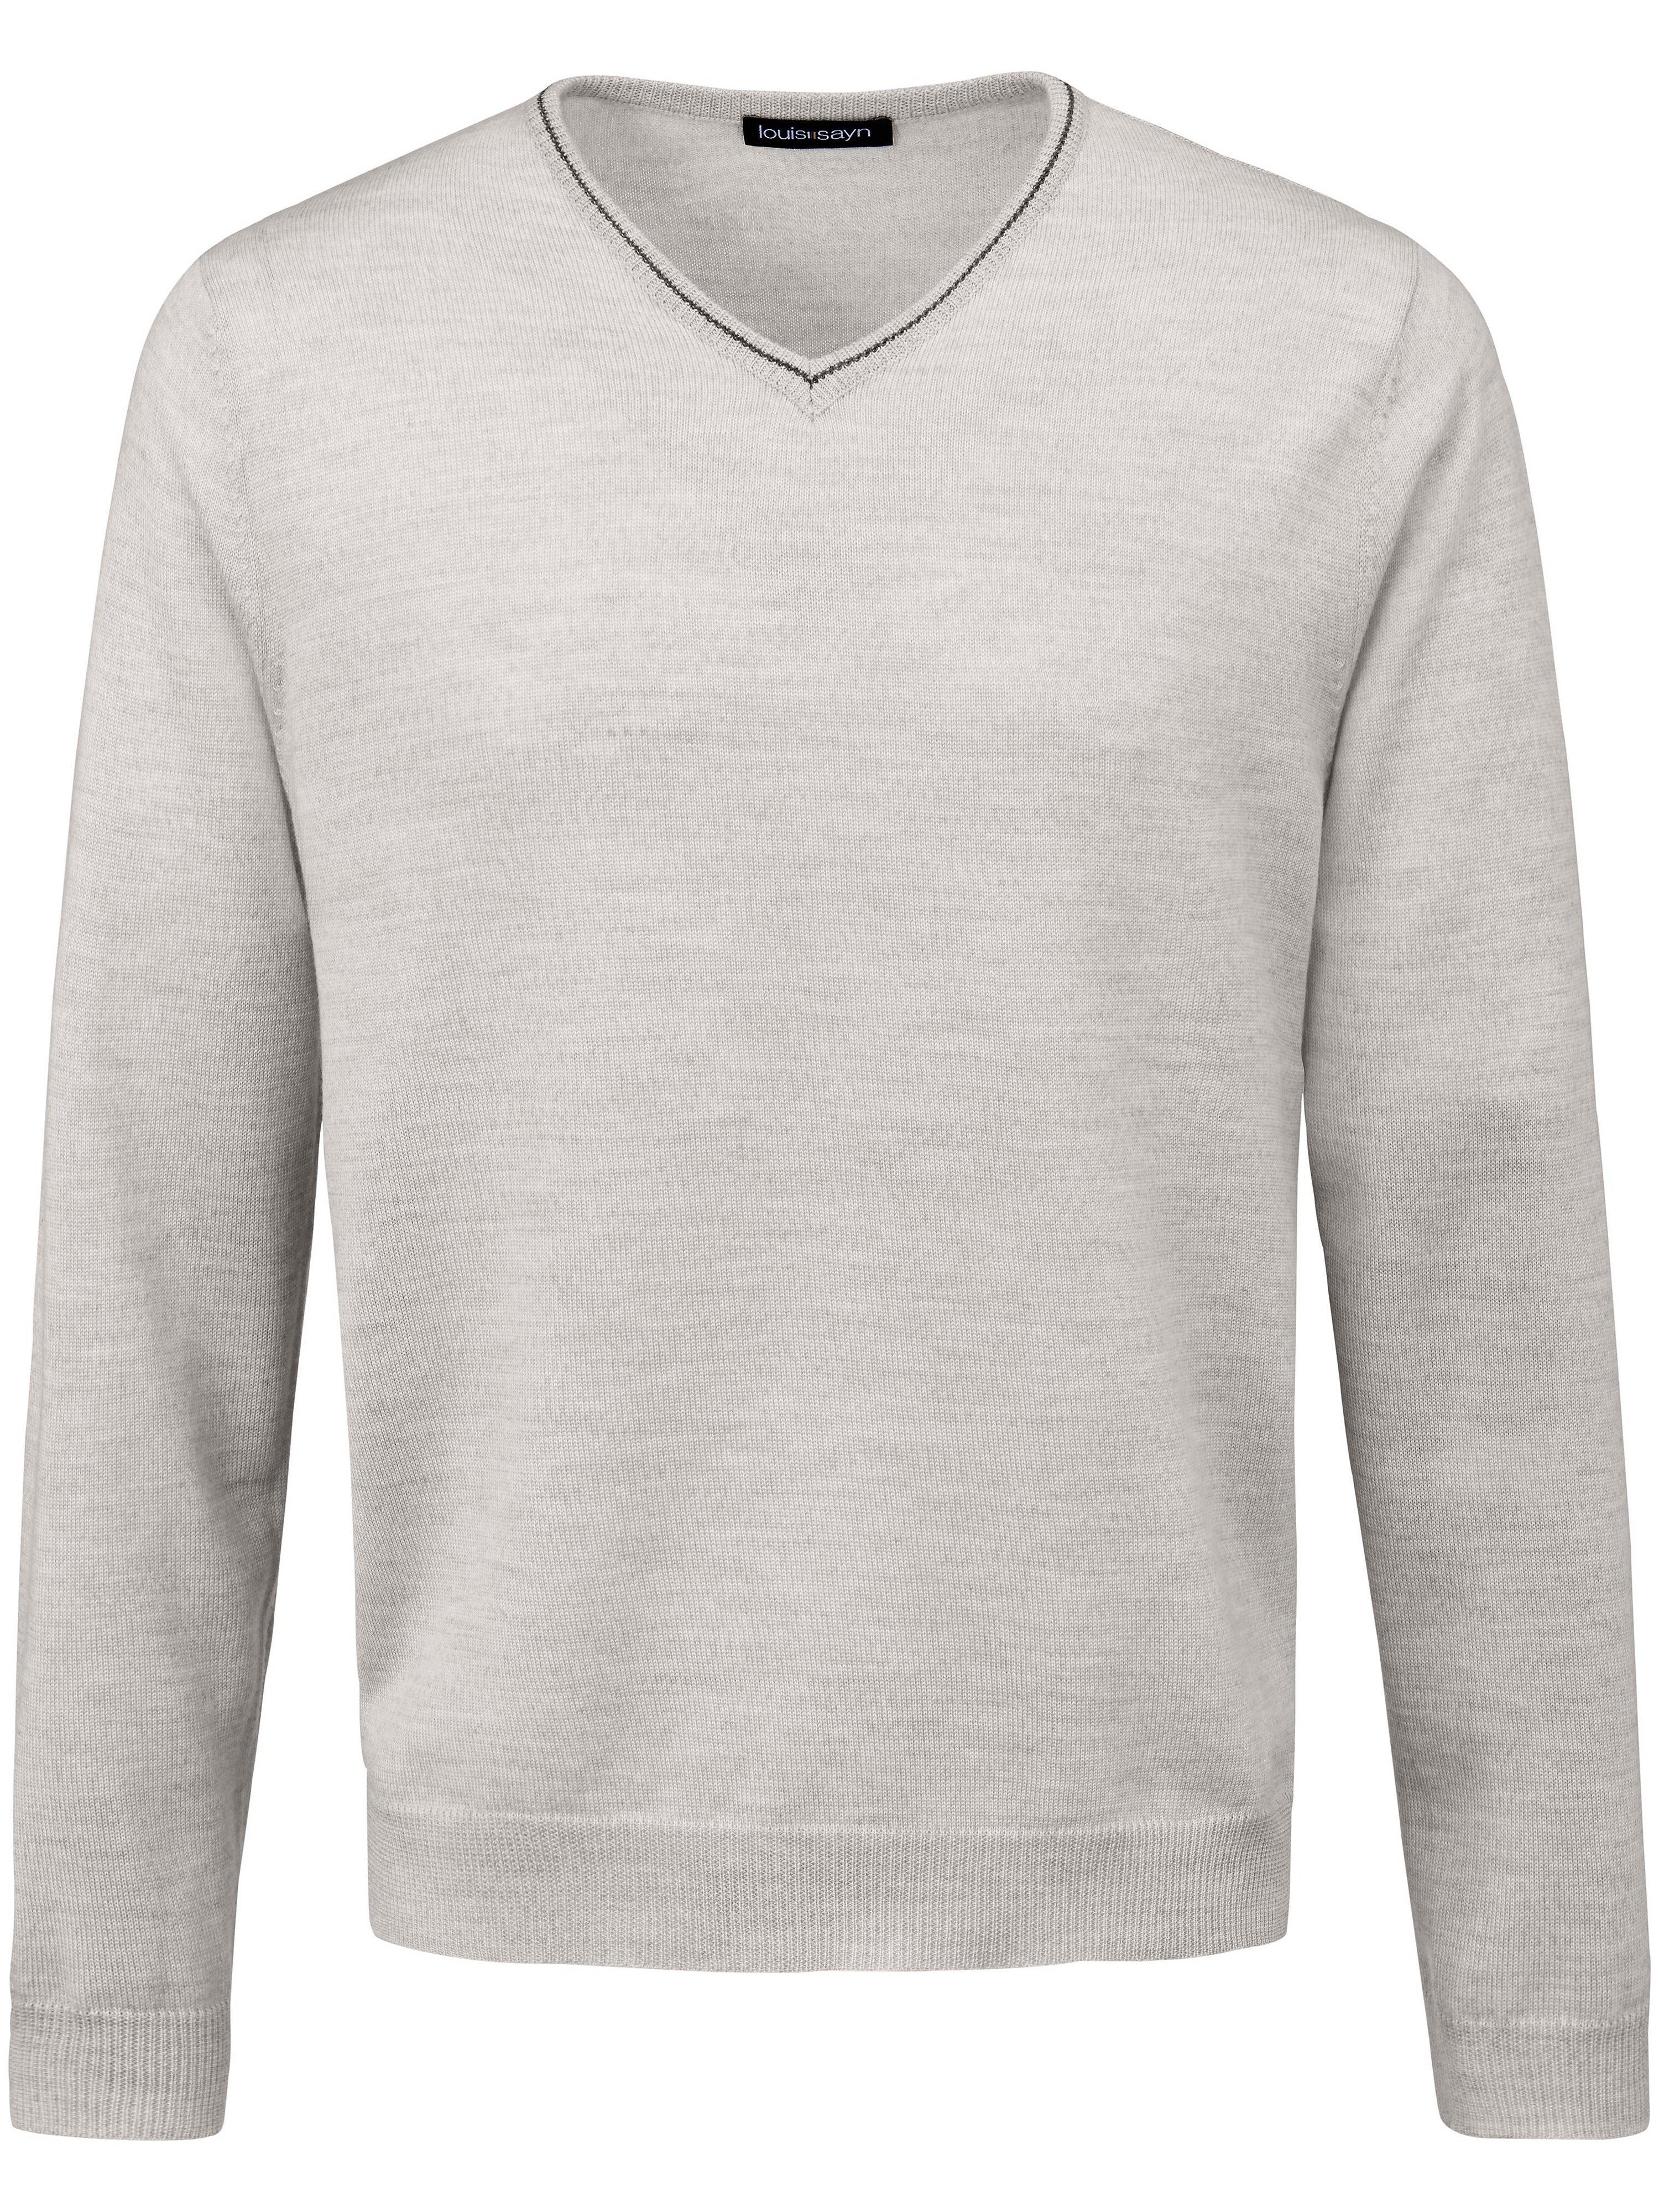 V-Pullover Louis Sayn grau | Bekleidung > Pullover > V-Pullover | Louis Sayn